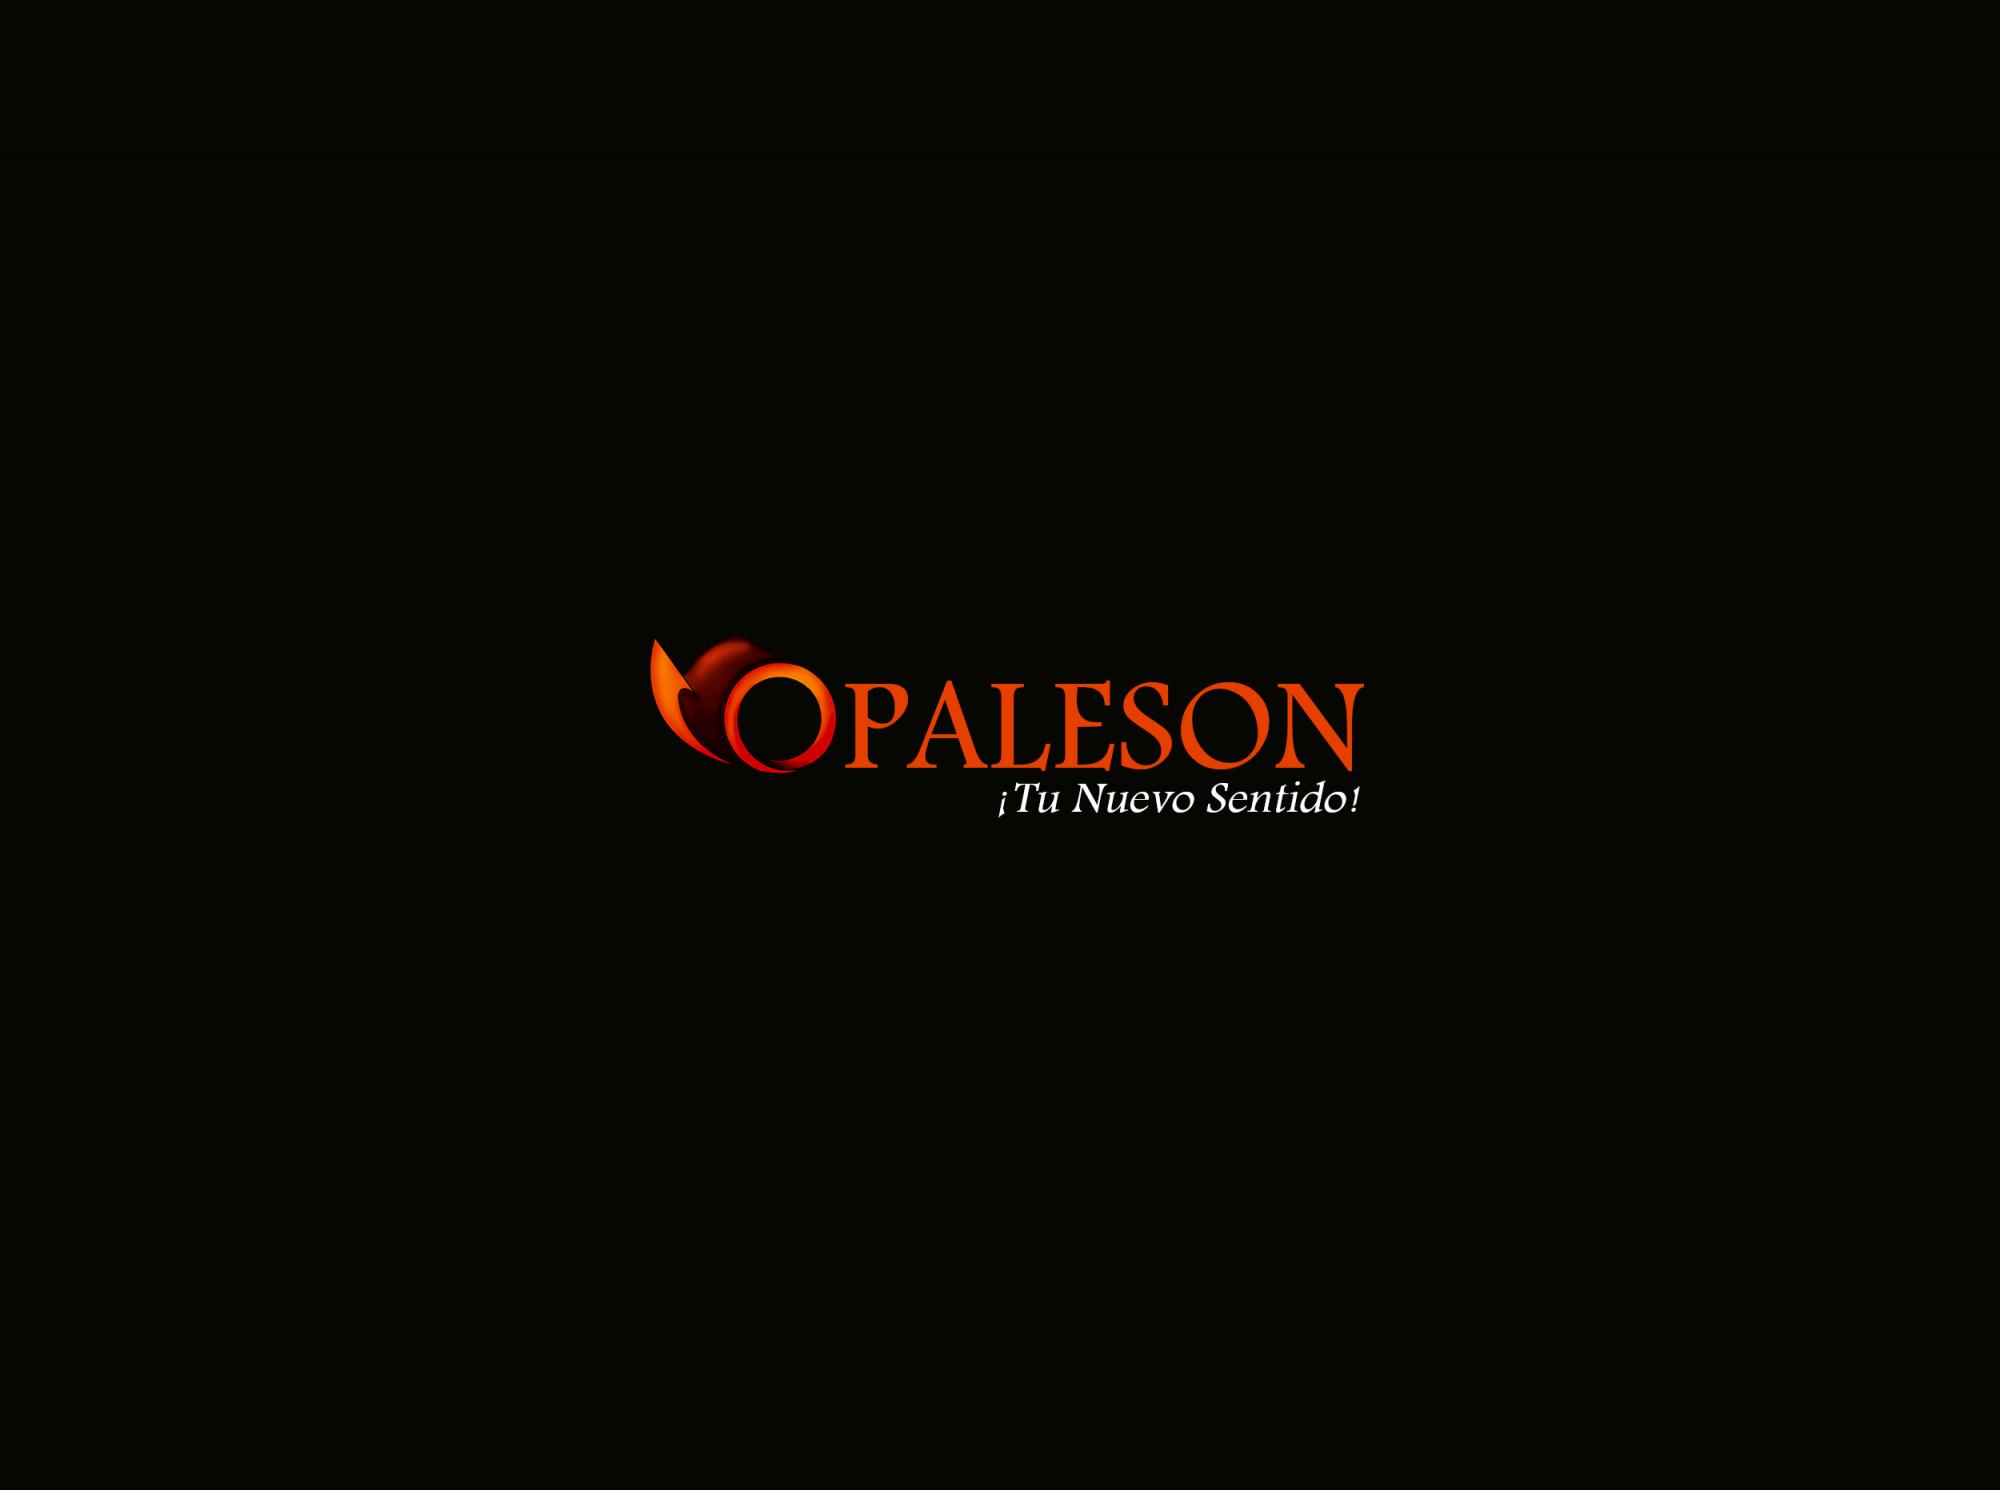 Vopaleson